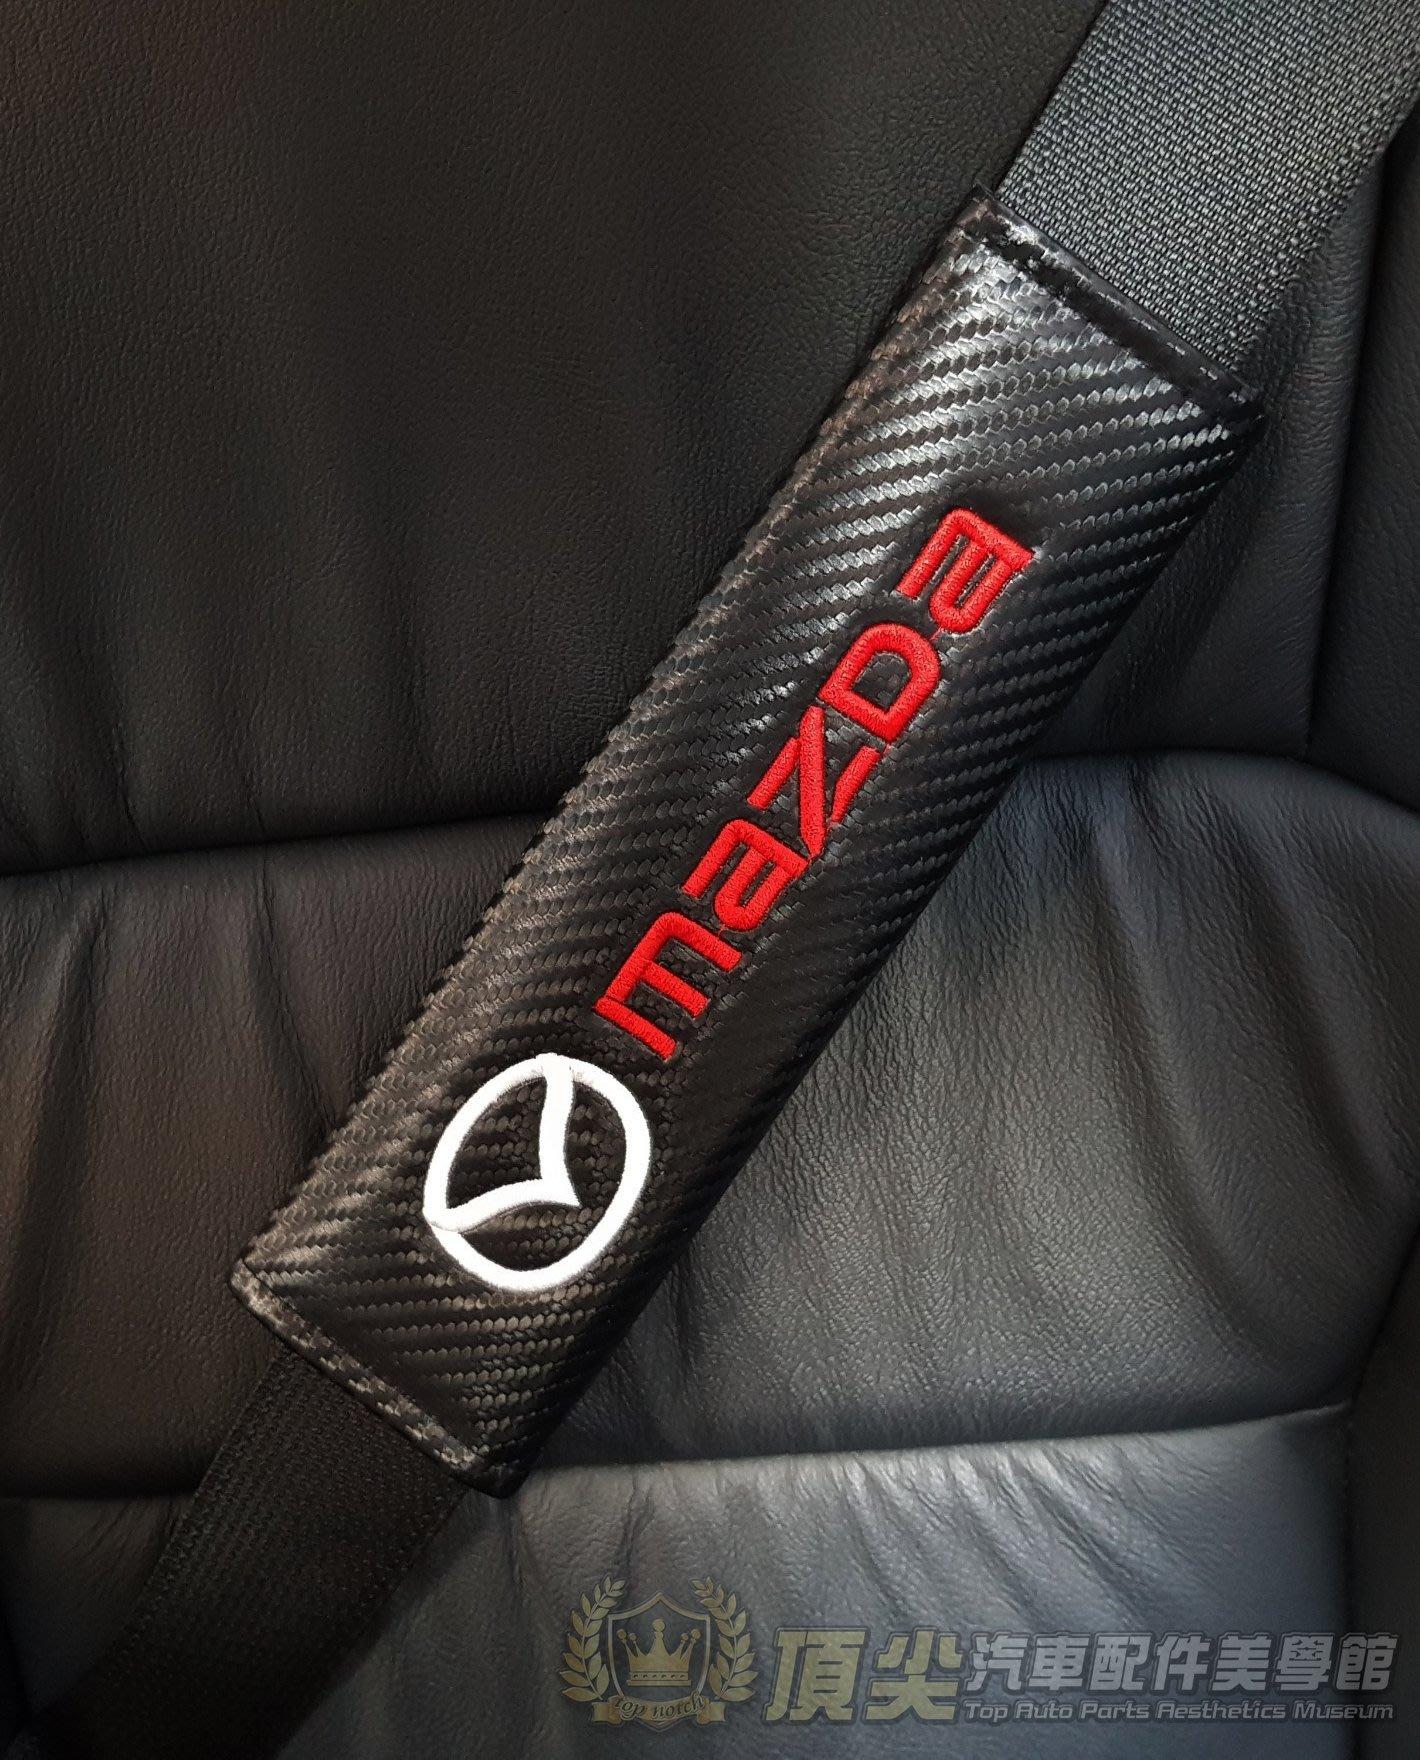 MAZDA3馬自達CX3 CX5【安全帶保護套】馬3 馬三 馬5專用配件 護肩套 安全皮套 車內飾品 卡夢碳纖紋安全帶套